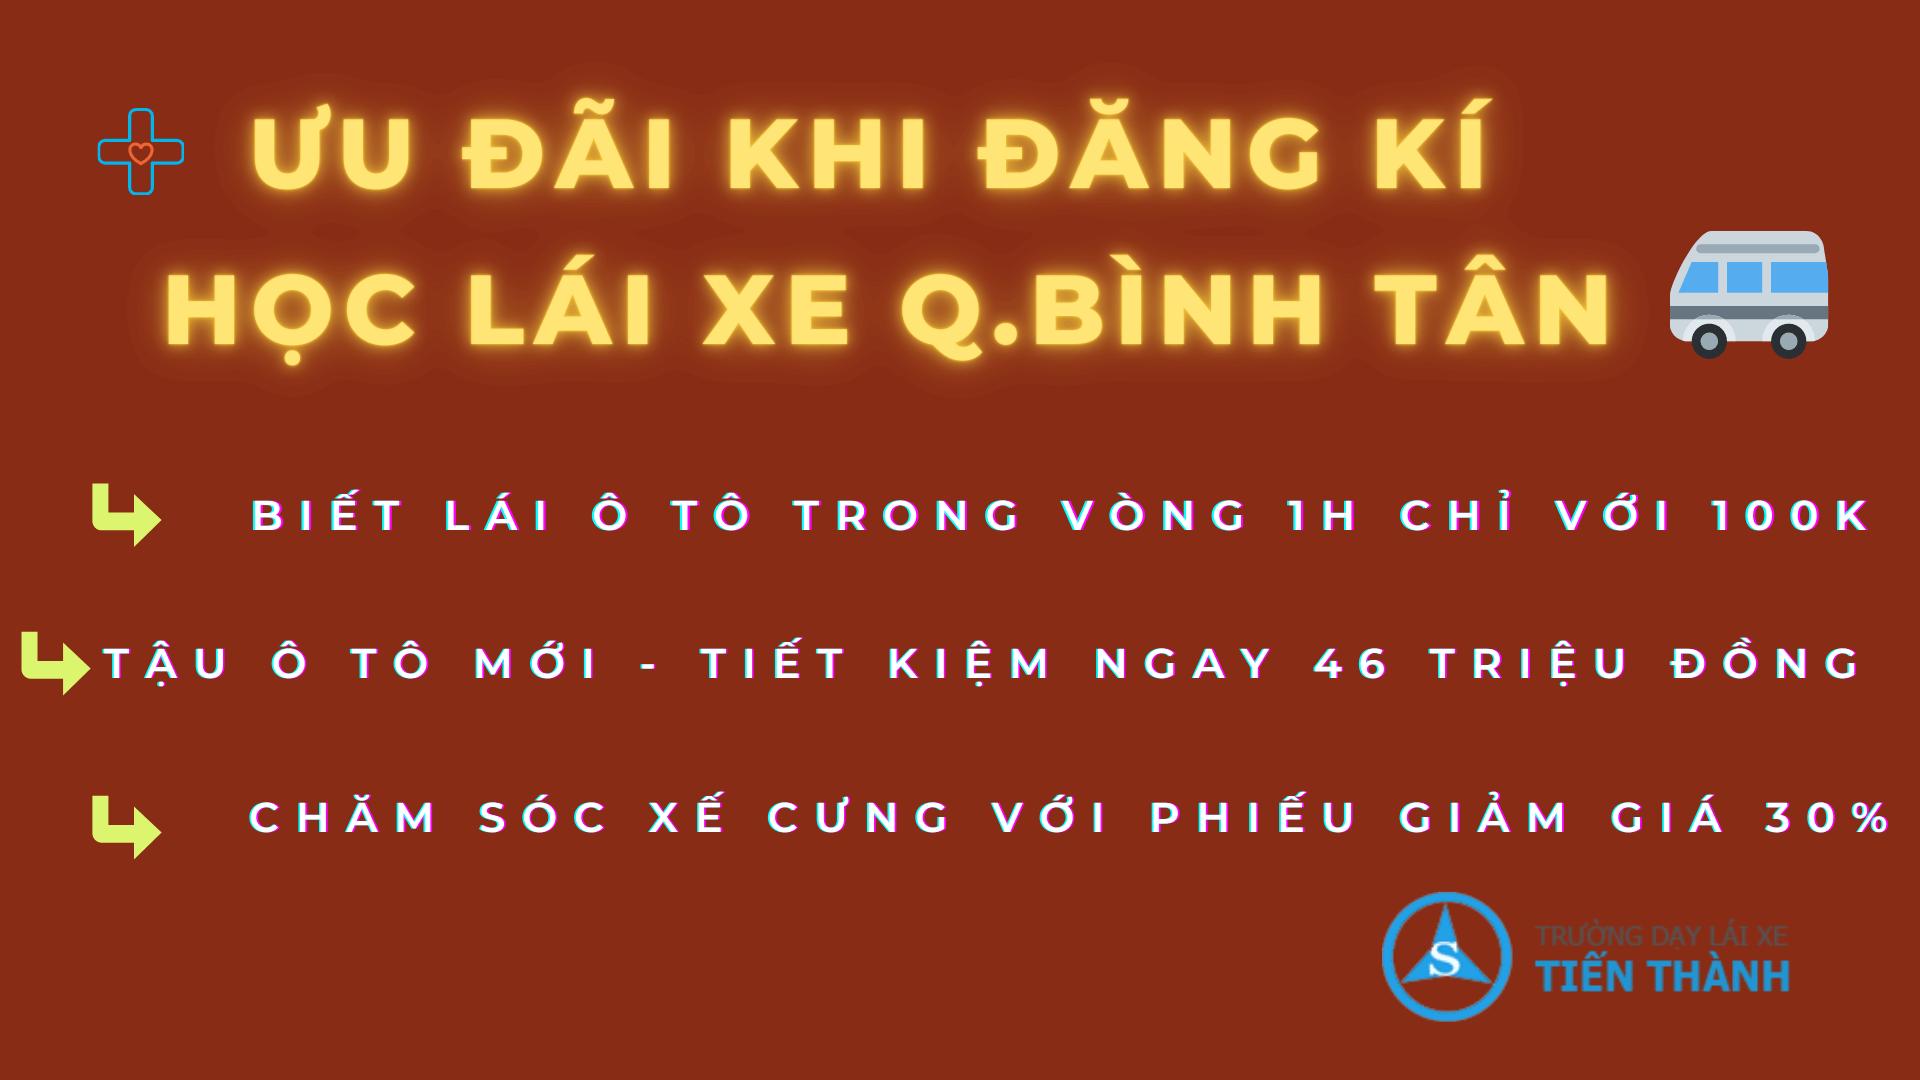 Uu_Dai_Khi_Dang_Ki_Hoc_Lai_Xe_Binh_Tan